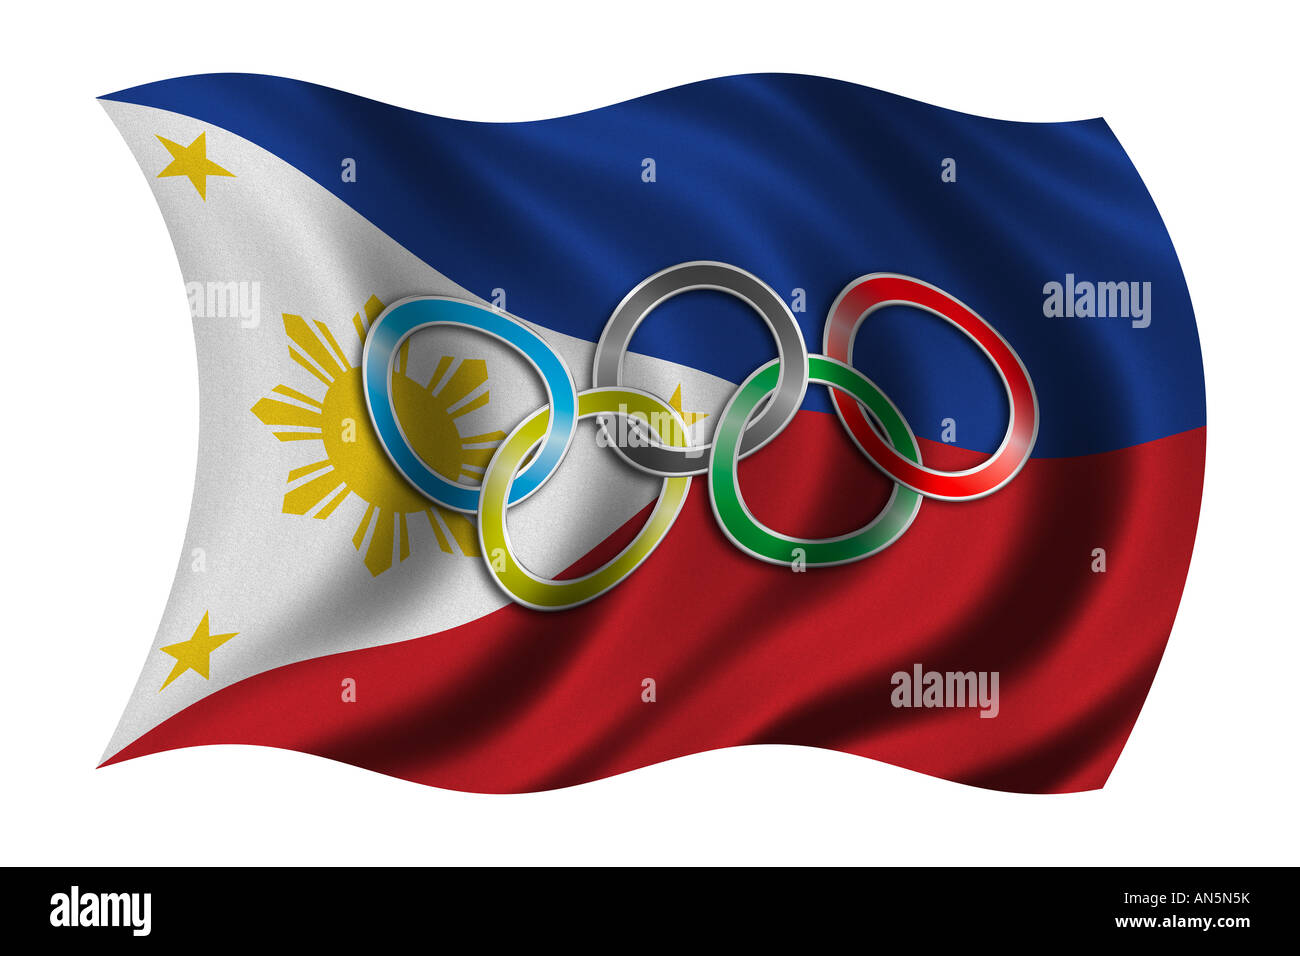 Flag of philippines with olympic symbol stock photo 15420558 alamy flag of philippines with olympic symbol buycottarizona Images